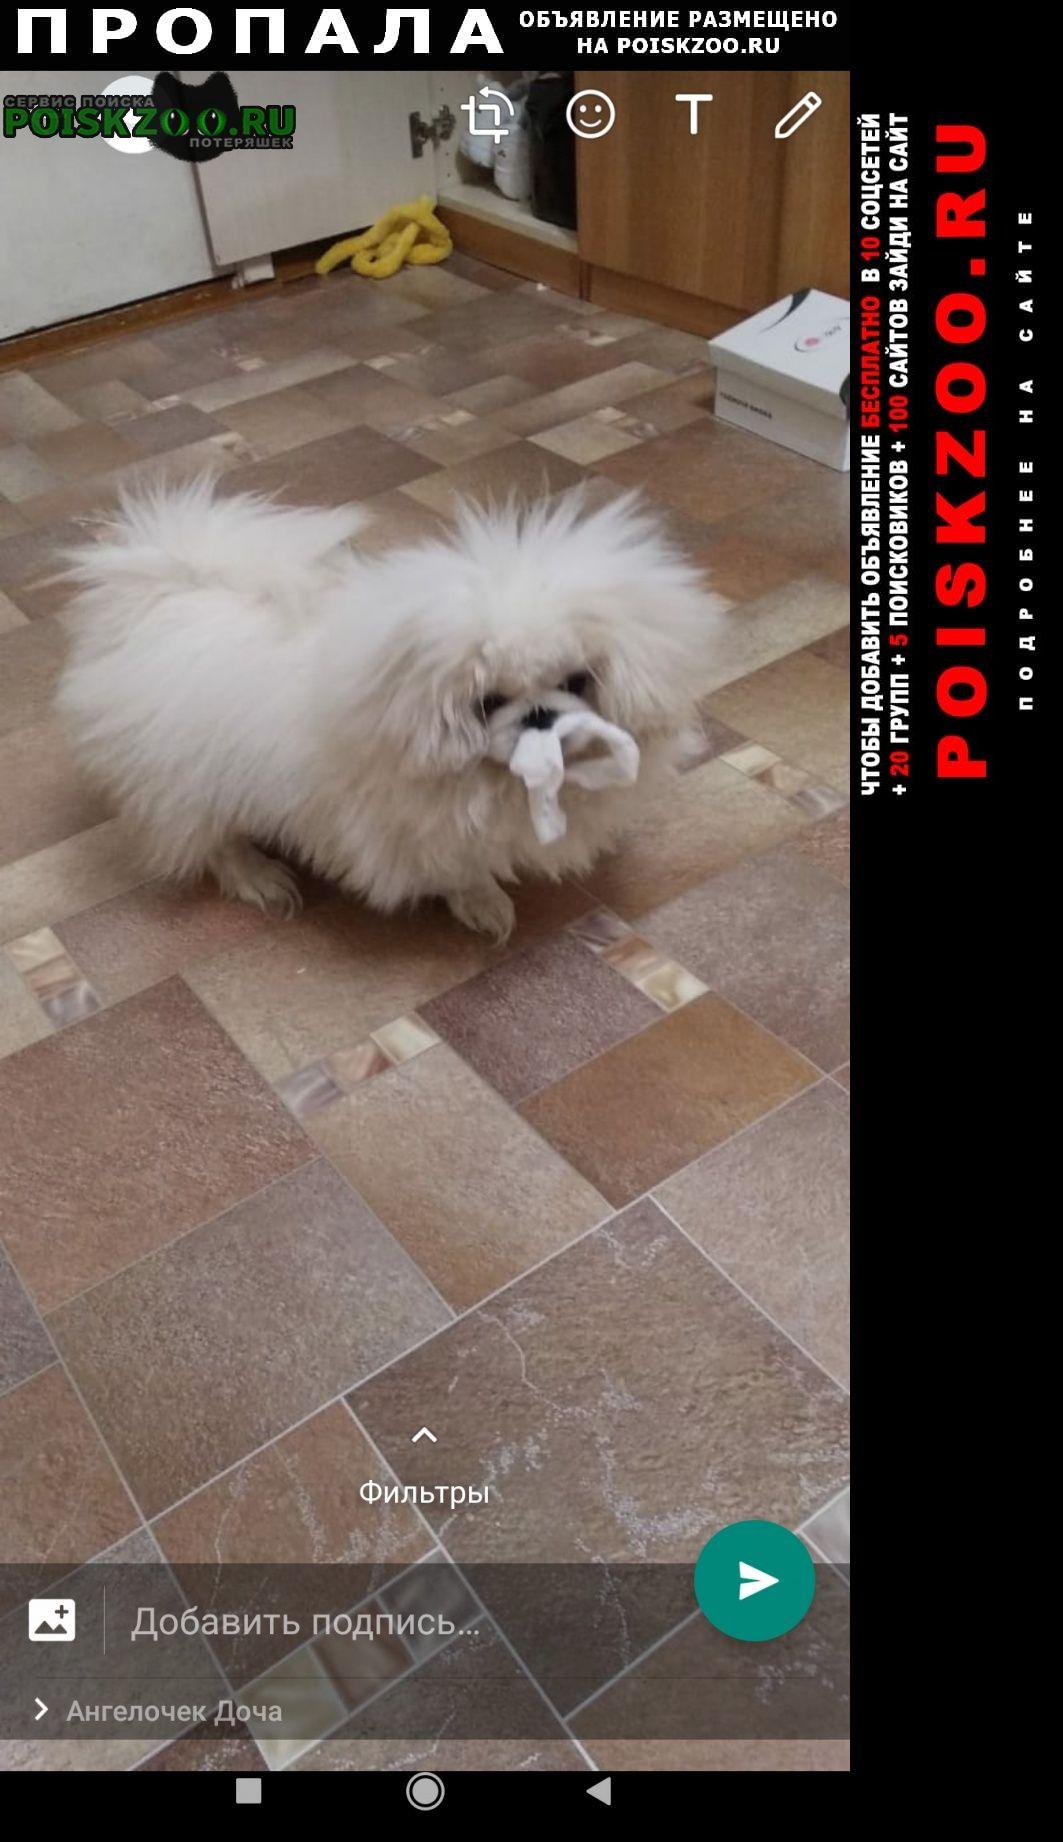 Пропала собака Домодедово